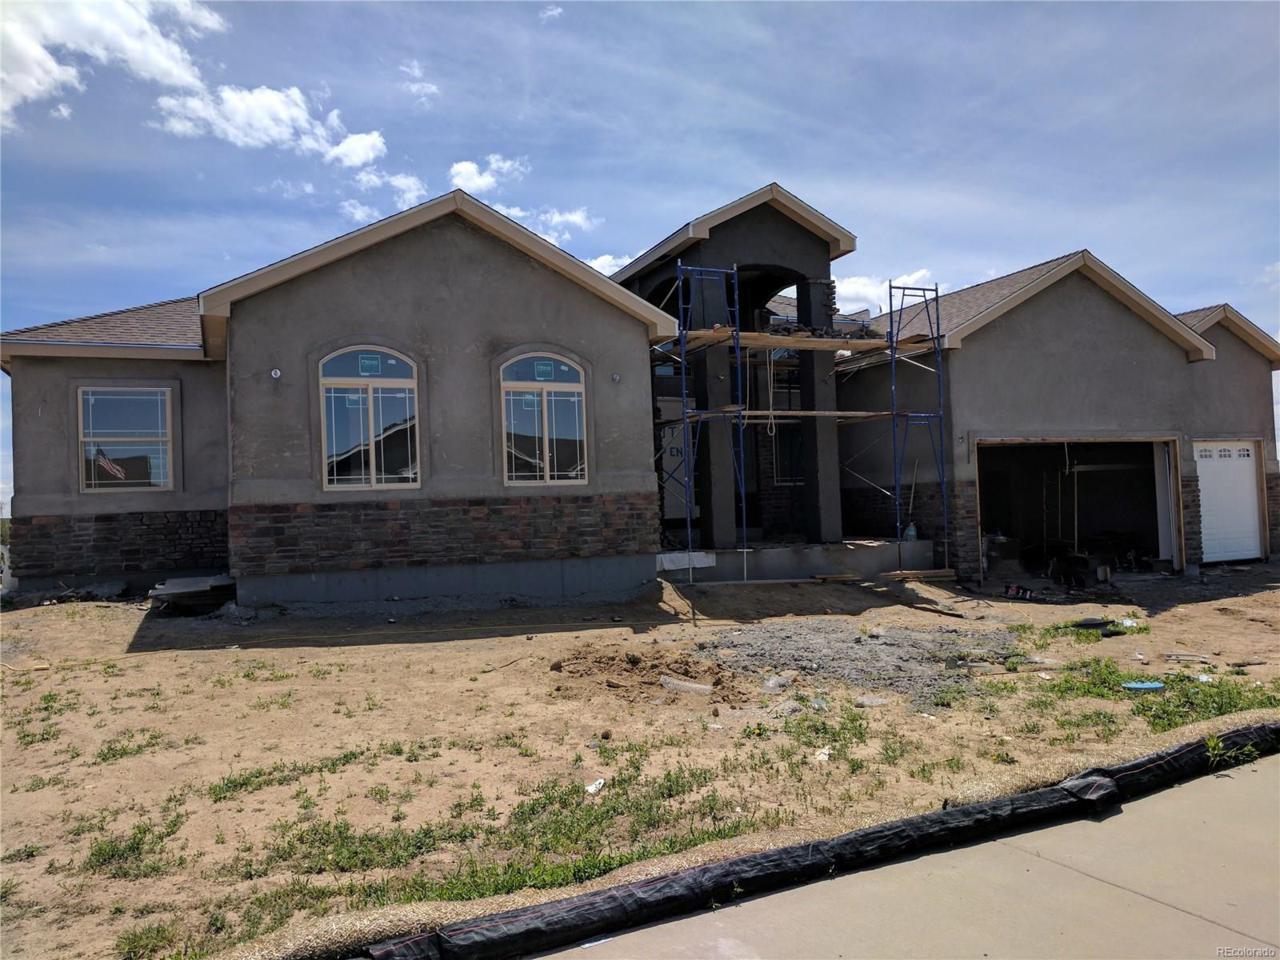 389 Corvette Circle, Fort Lupton, CO 80621 (MLS #6130431) :: 8z Real Estate